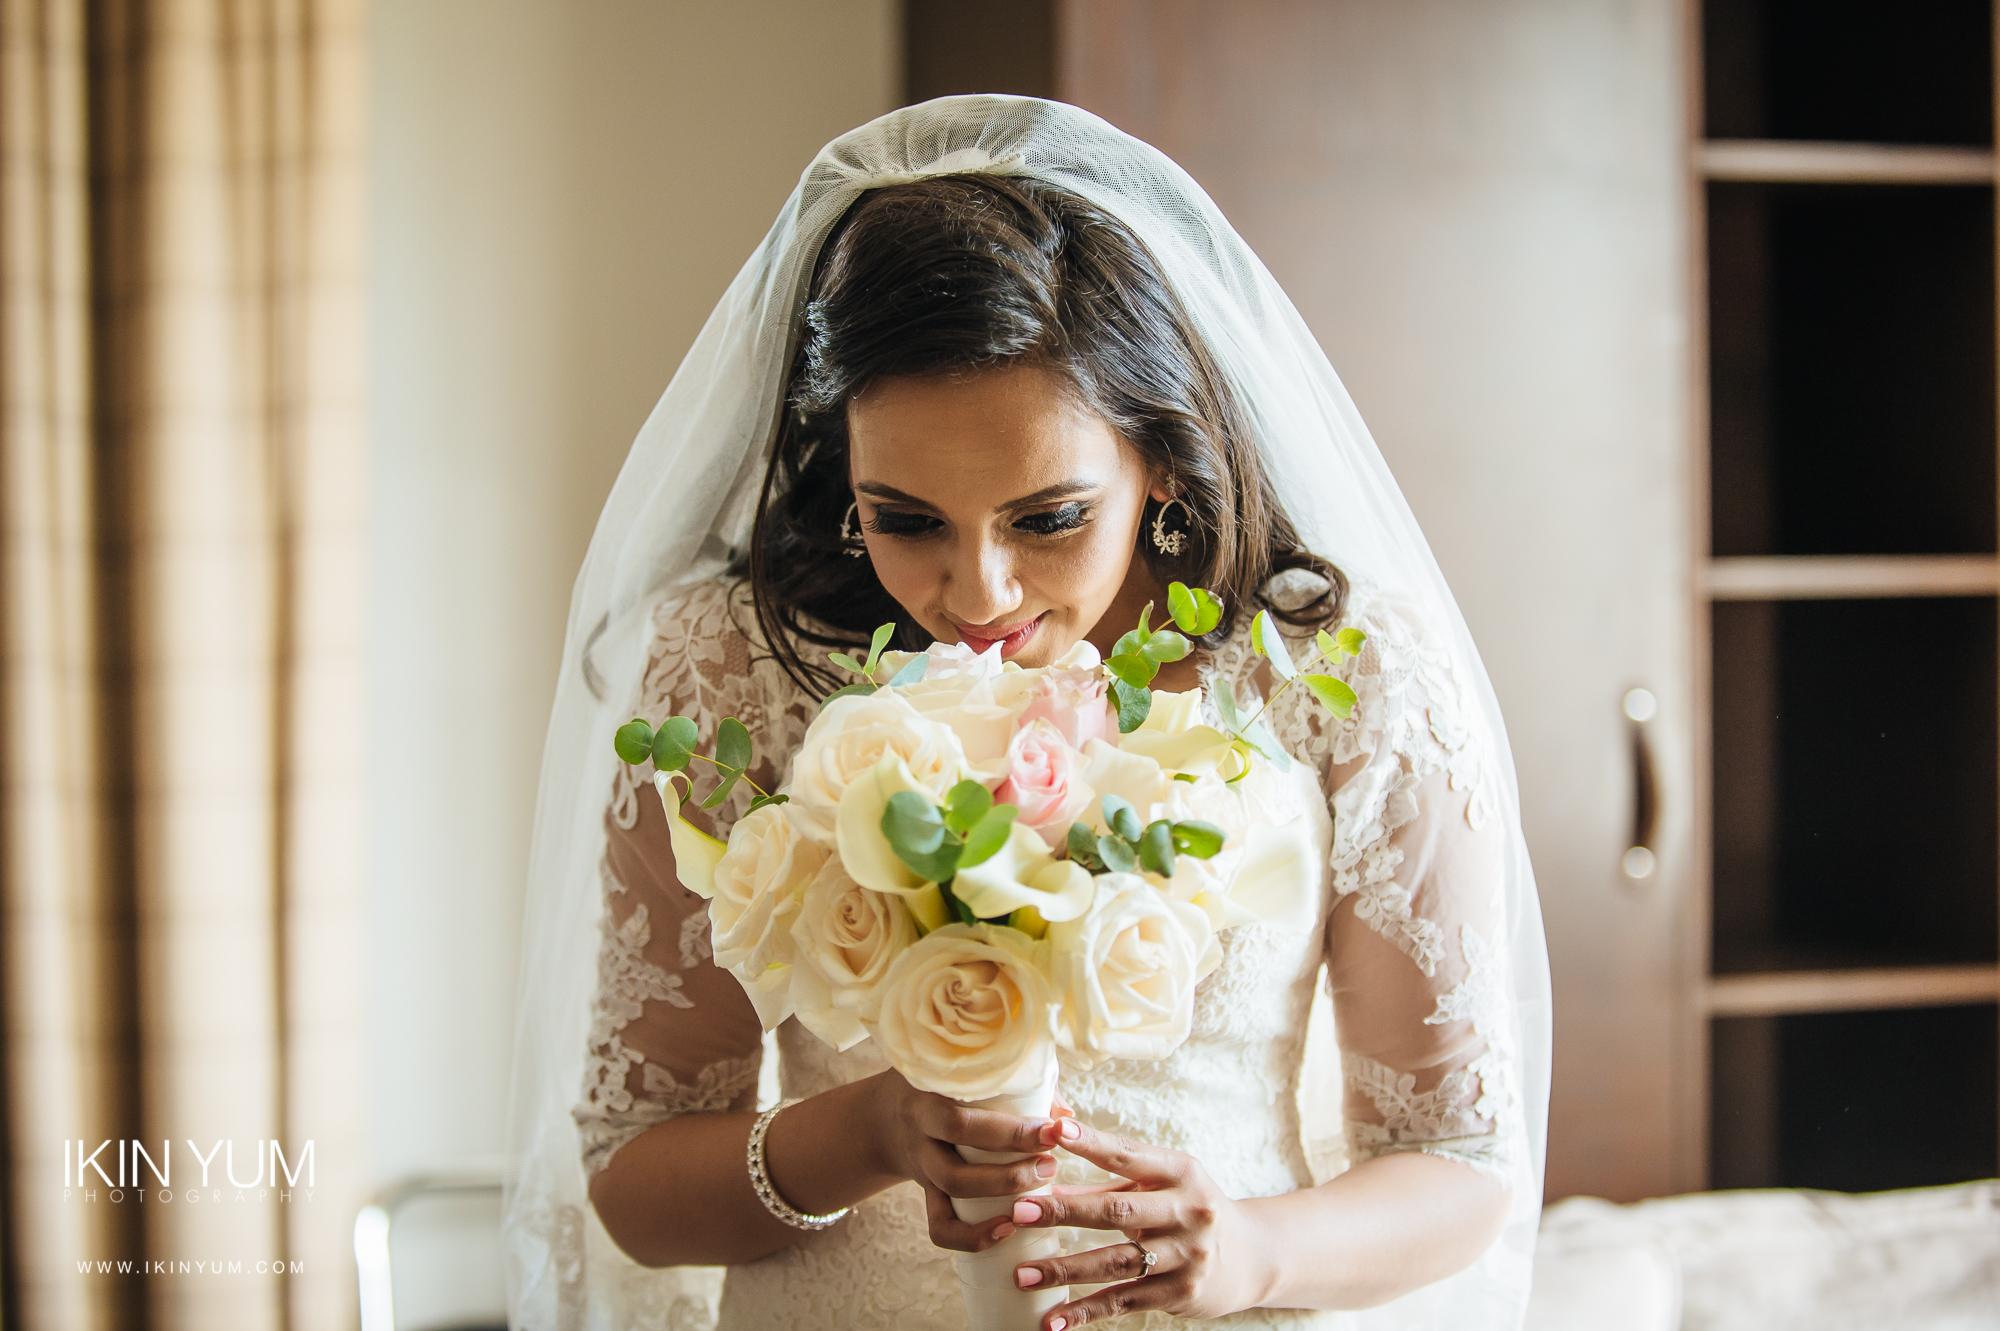 Laura Ashley Manor Wedding - Ikin Yum Photography-020.jpg